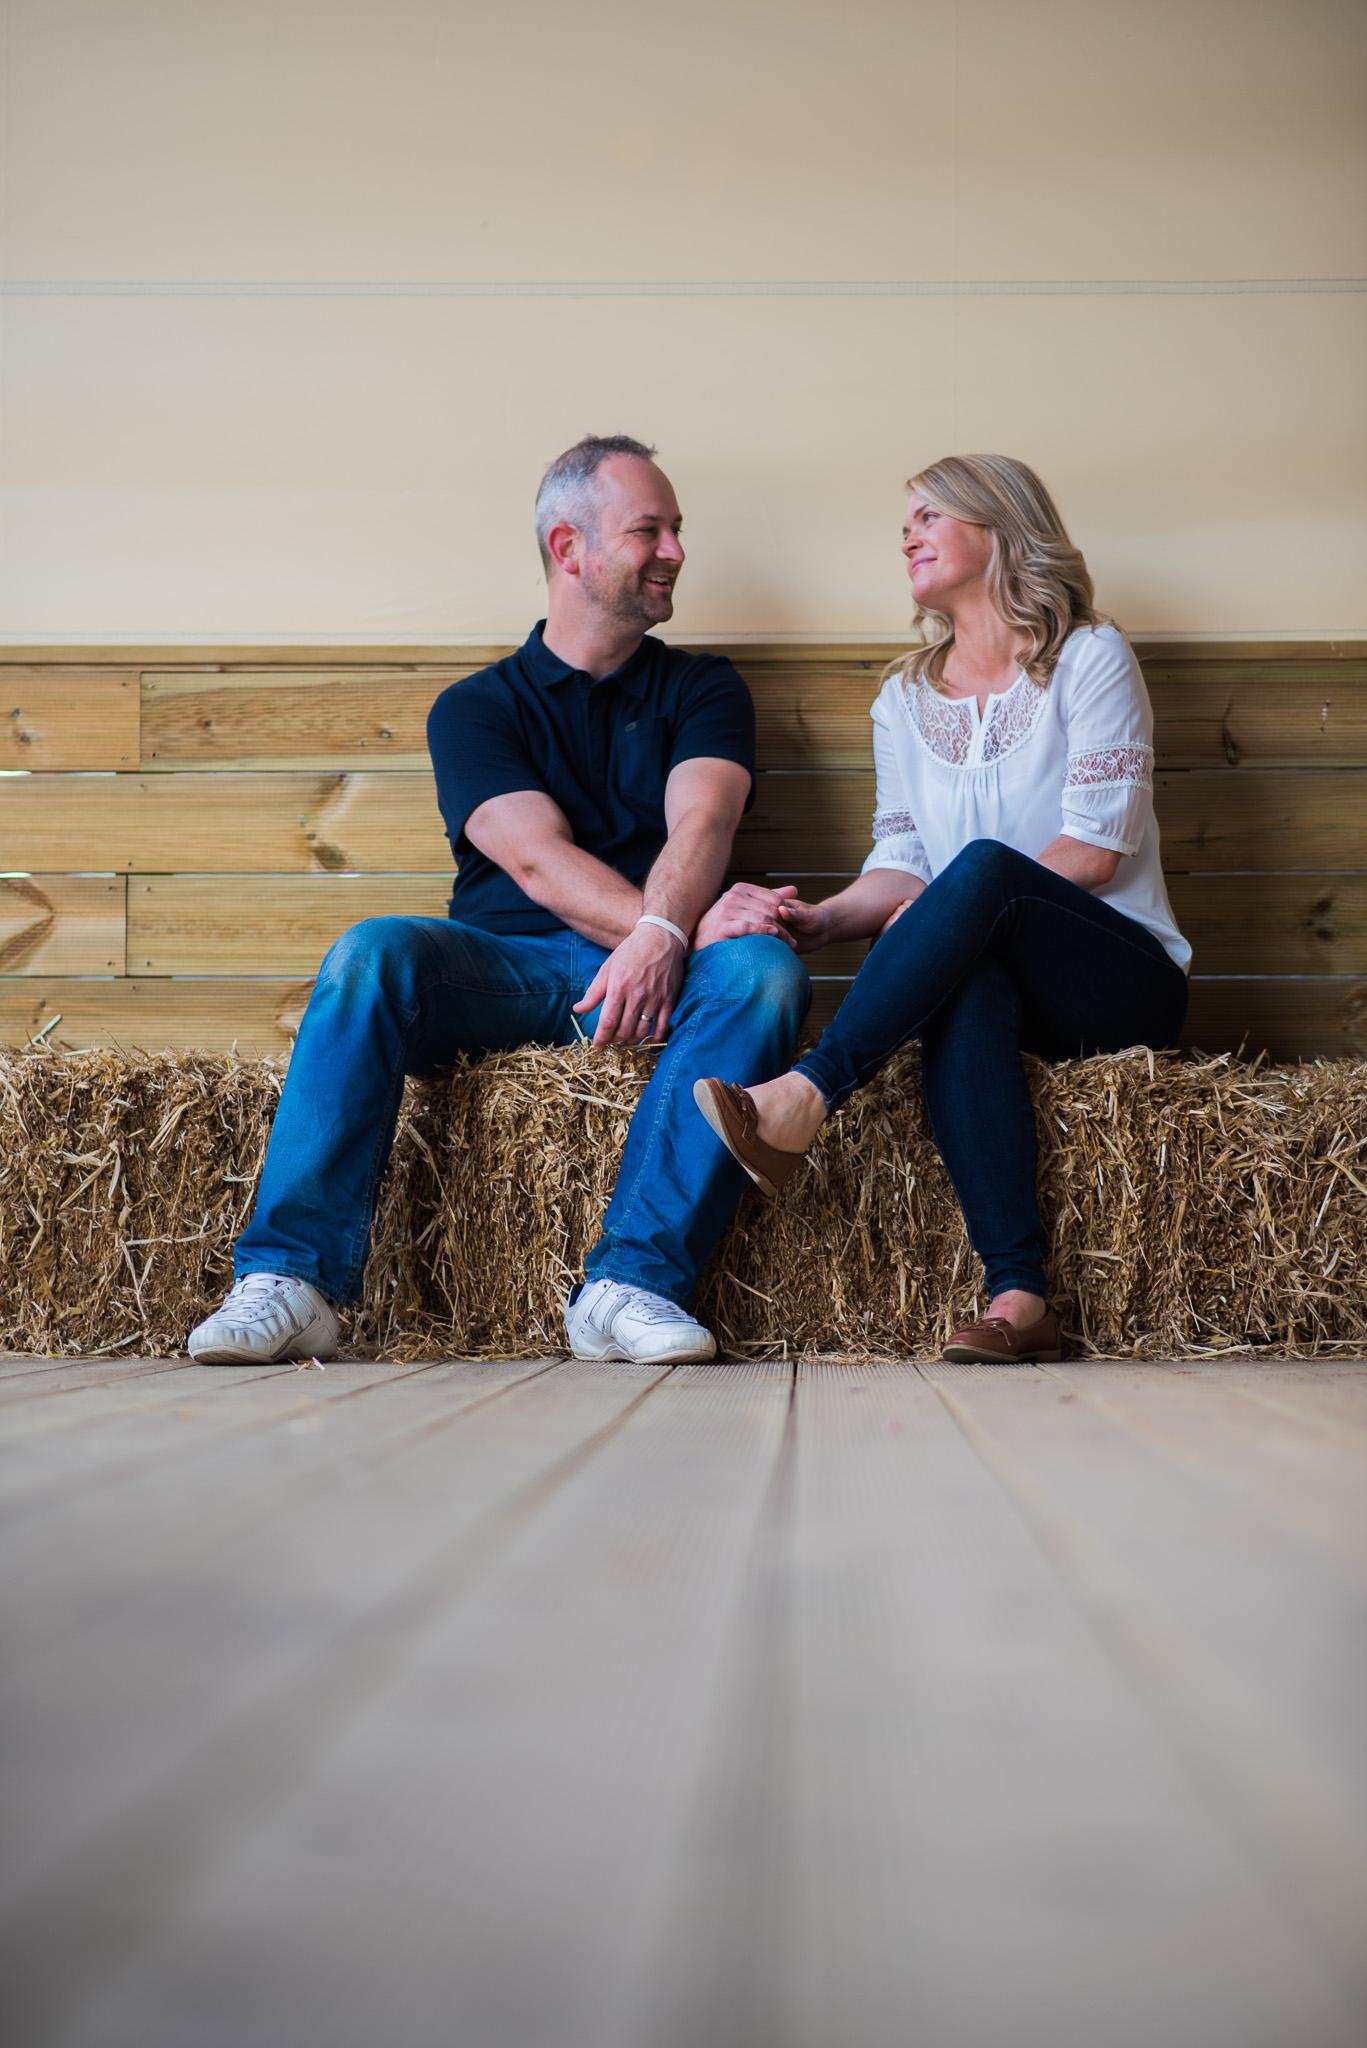 Inside barn at Dalduff Farm for Engagement Session